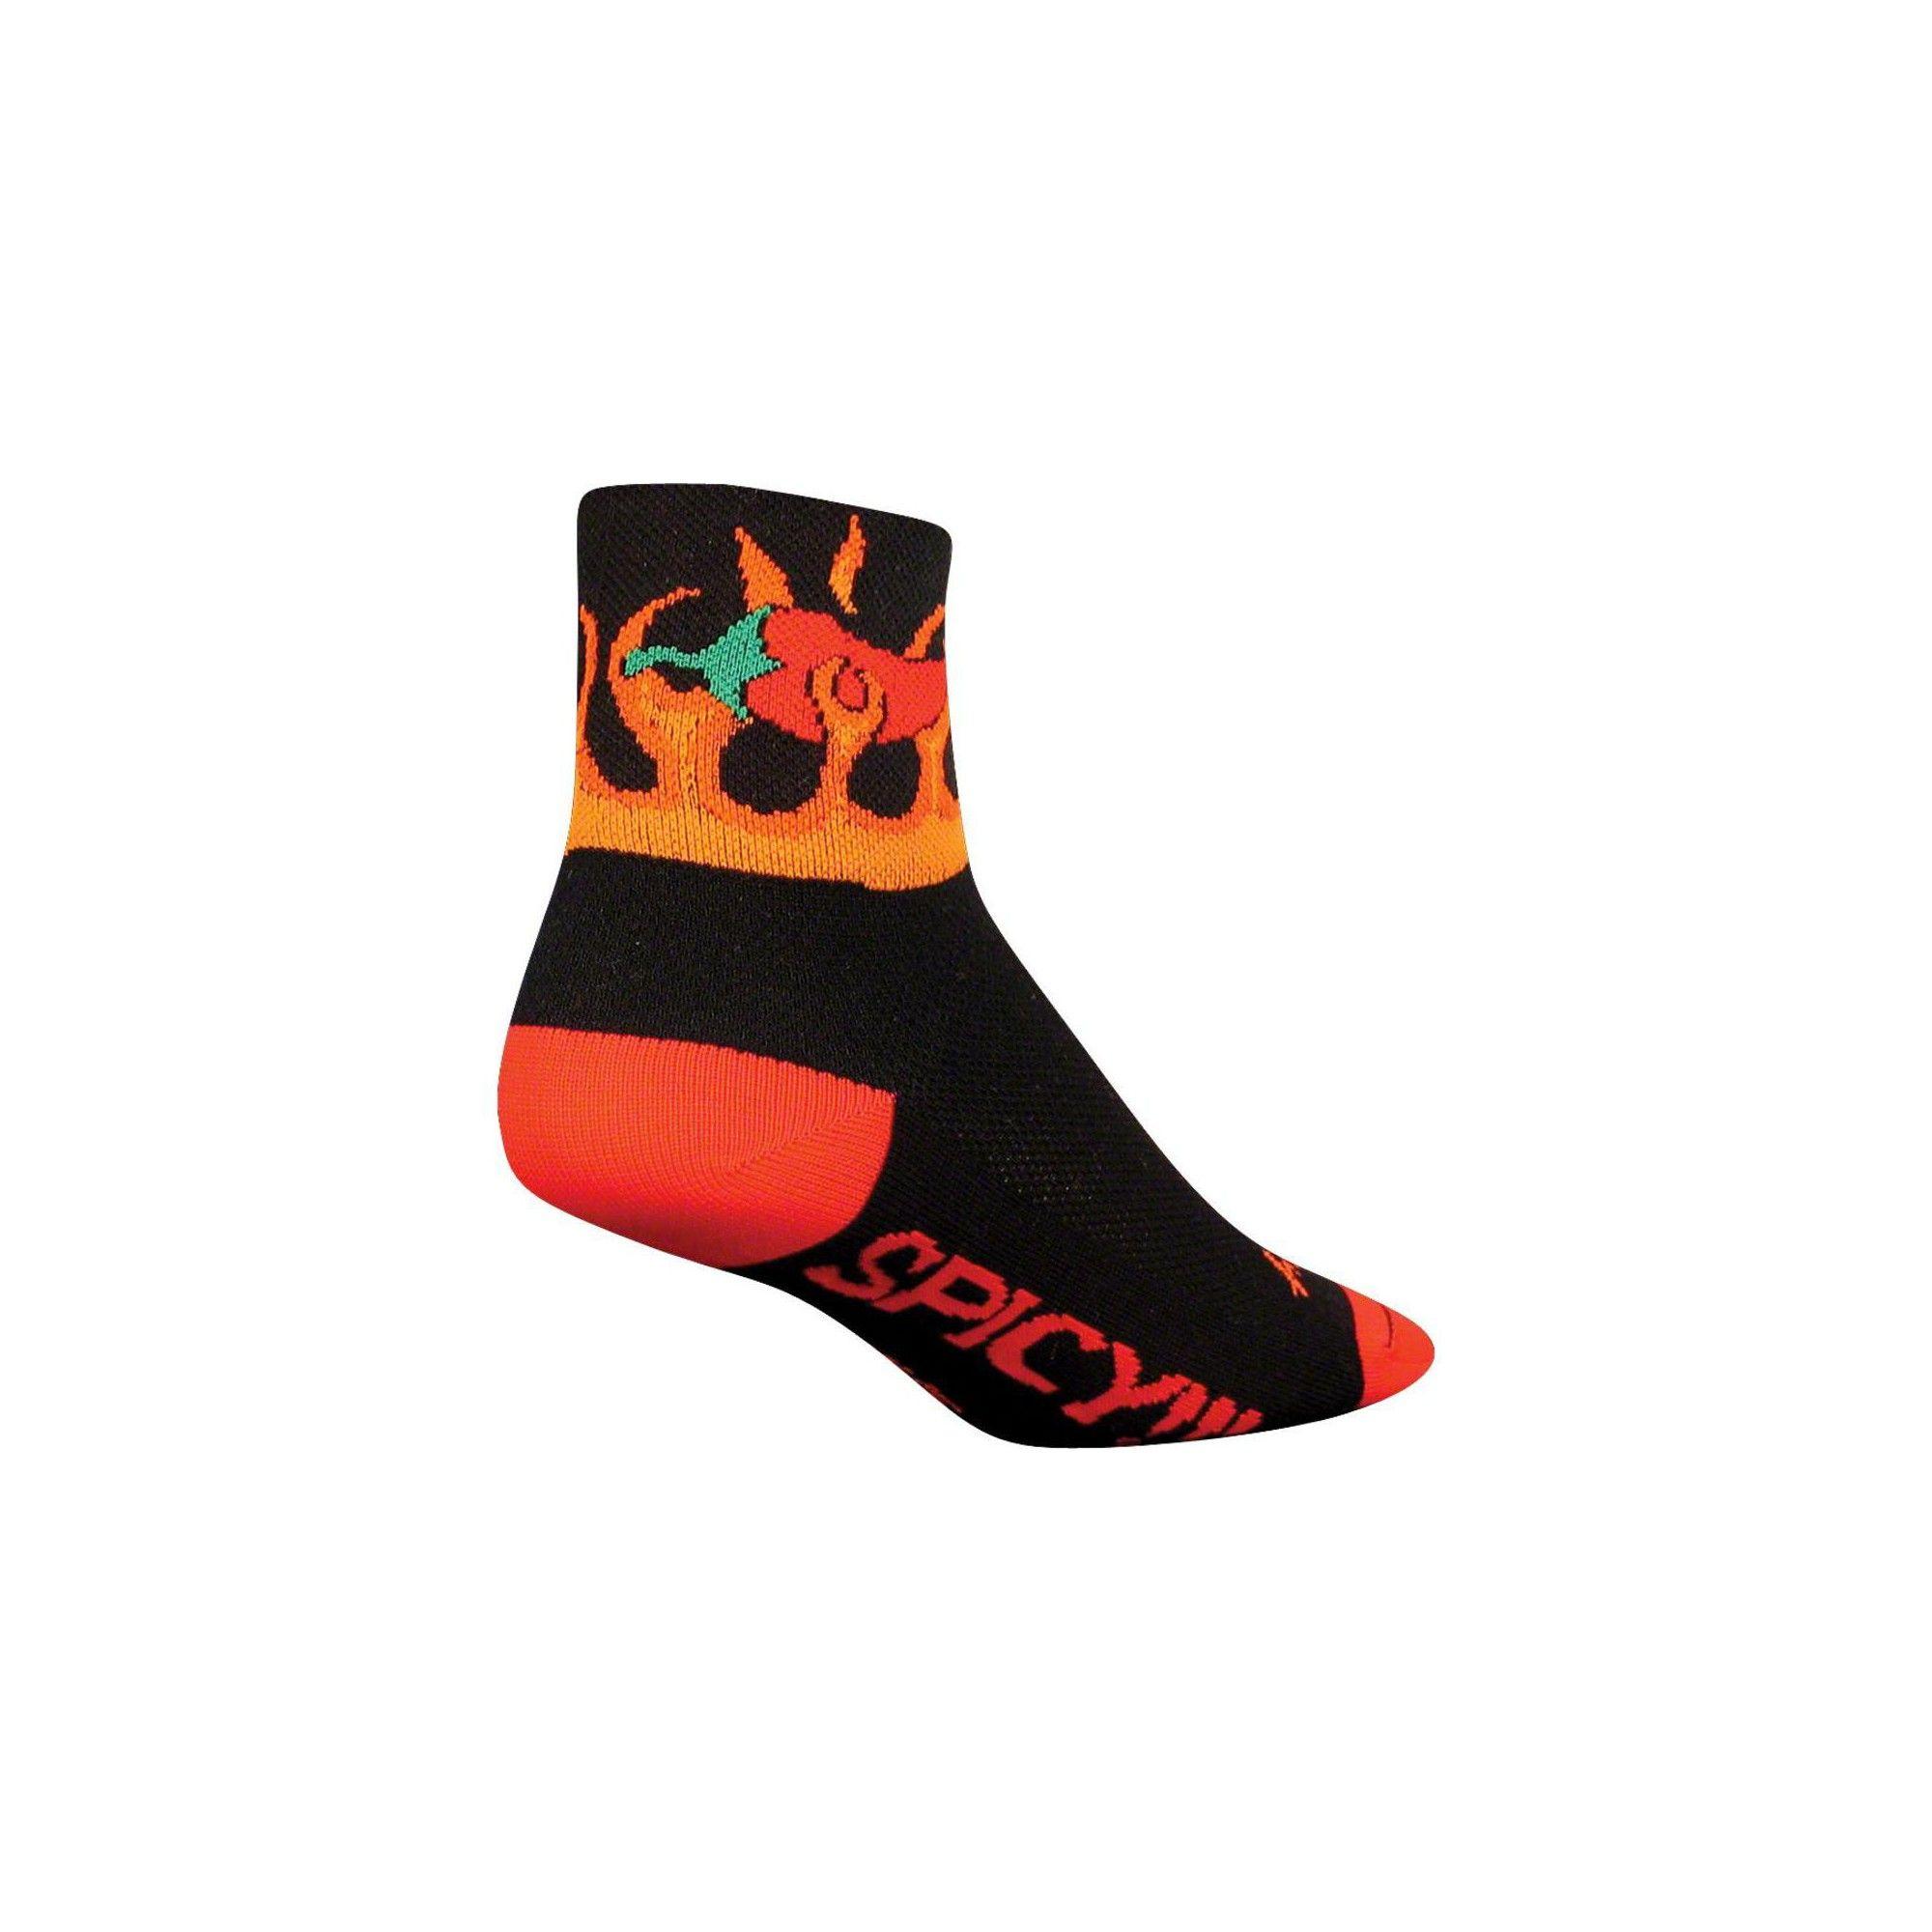 SockGuy Classic Spicy Sock Black LG//XL